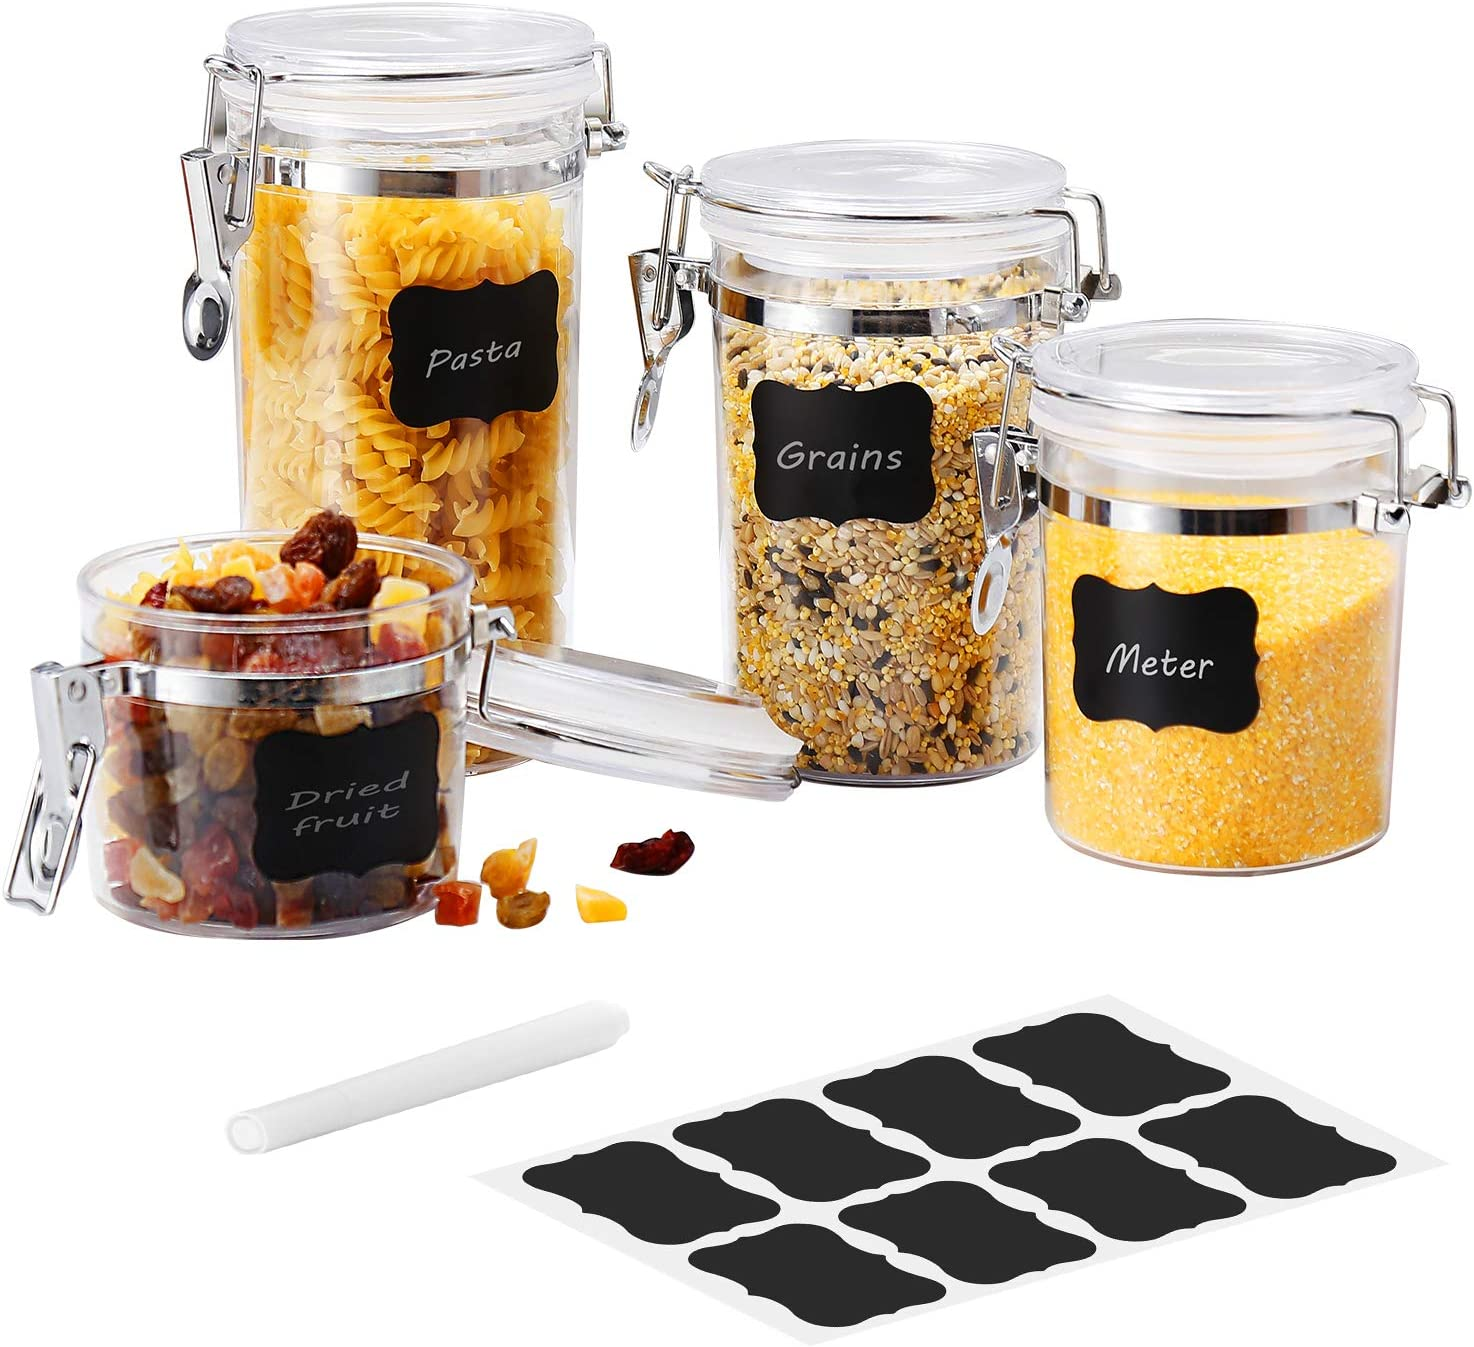 Airtight Acrylic Canister Max 69% OFF Set of 4 Storage Food - Farochy Super intense SALE A Jar